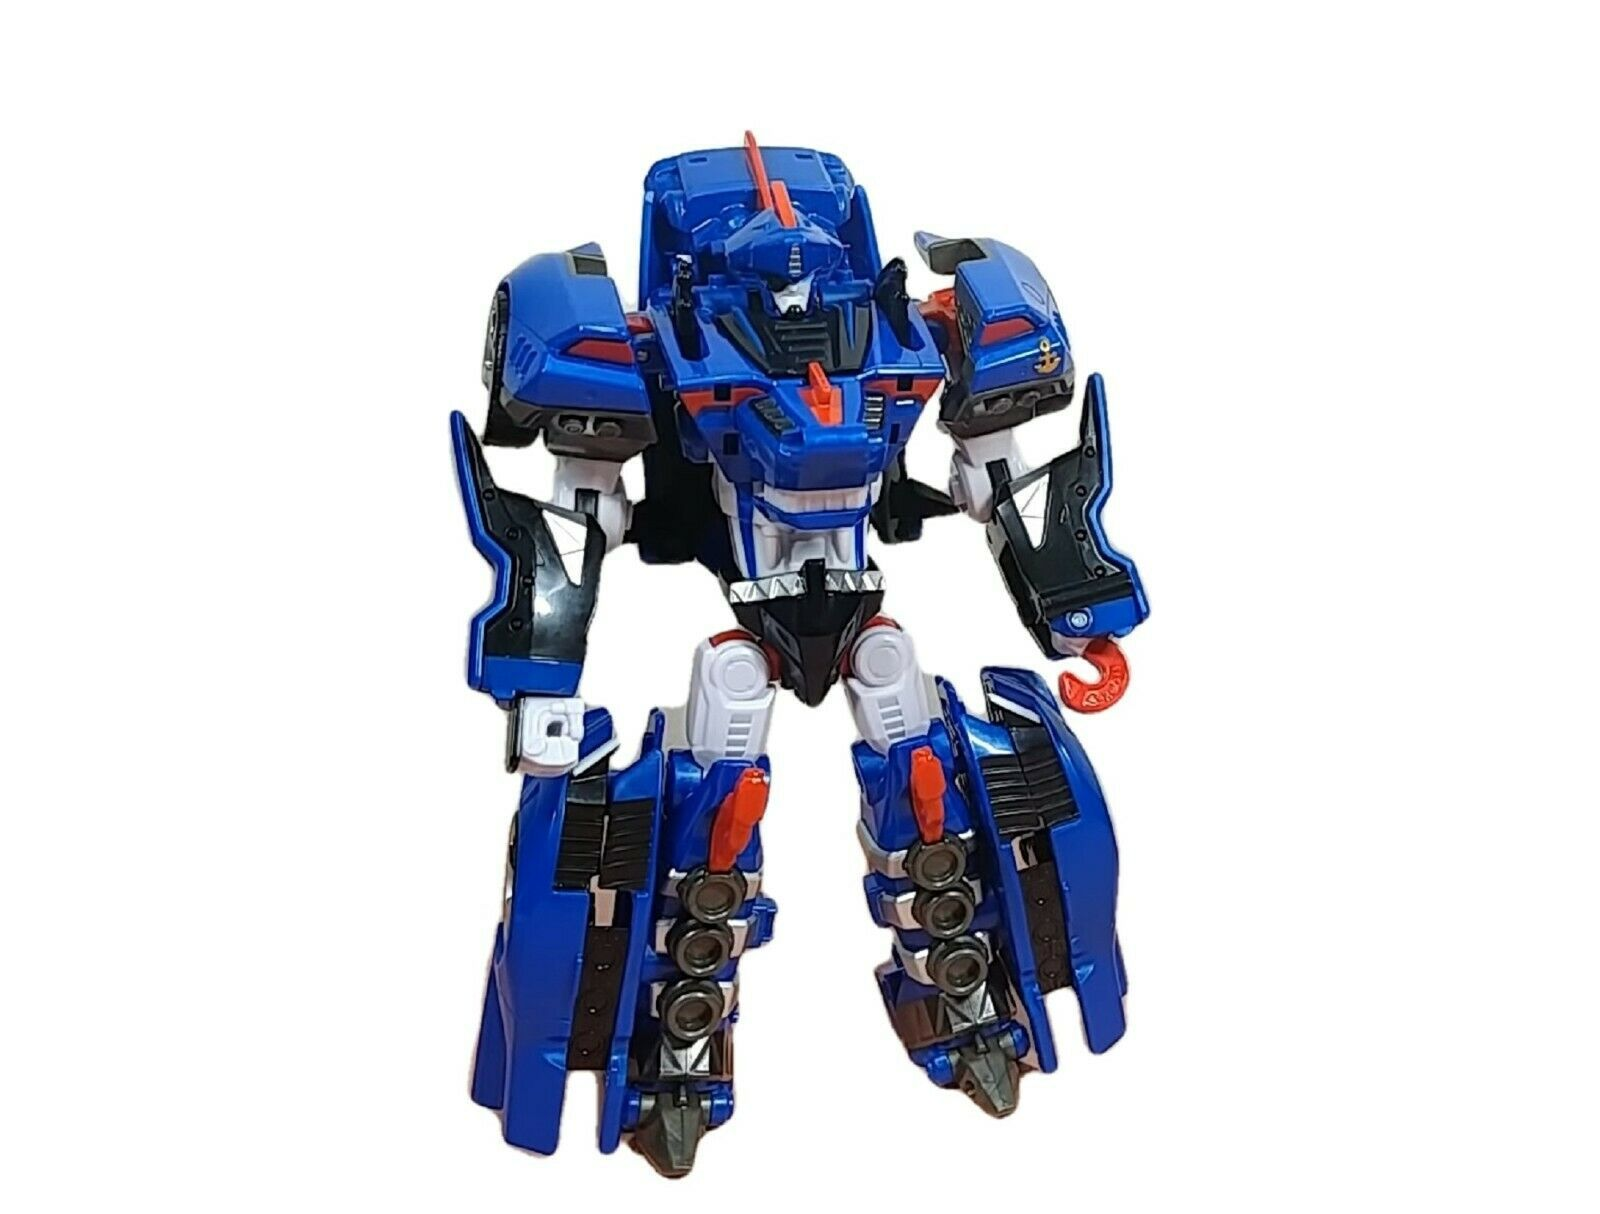 Tobot Captain Jack Action Figure Toy Robot